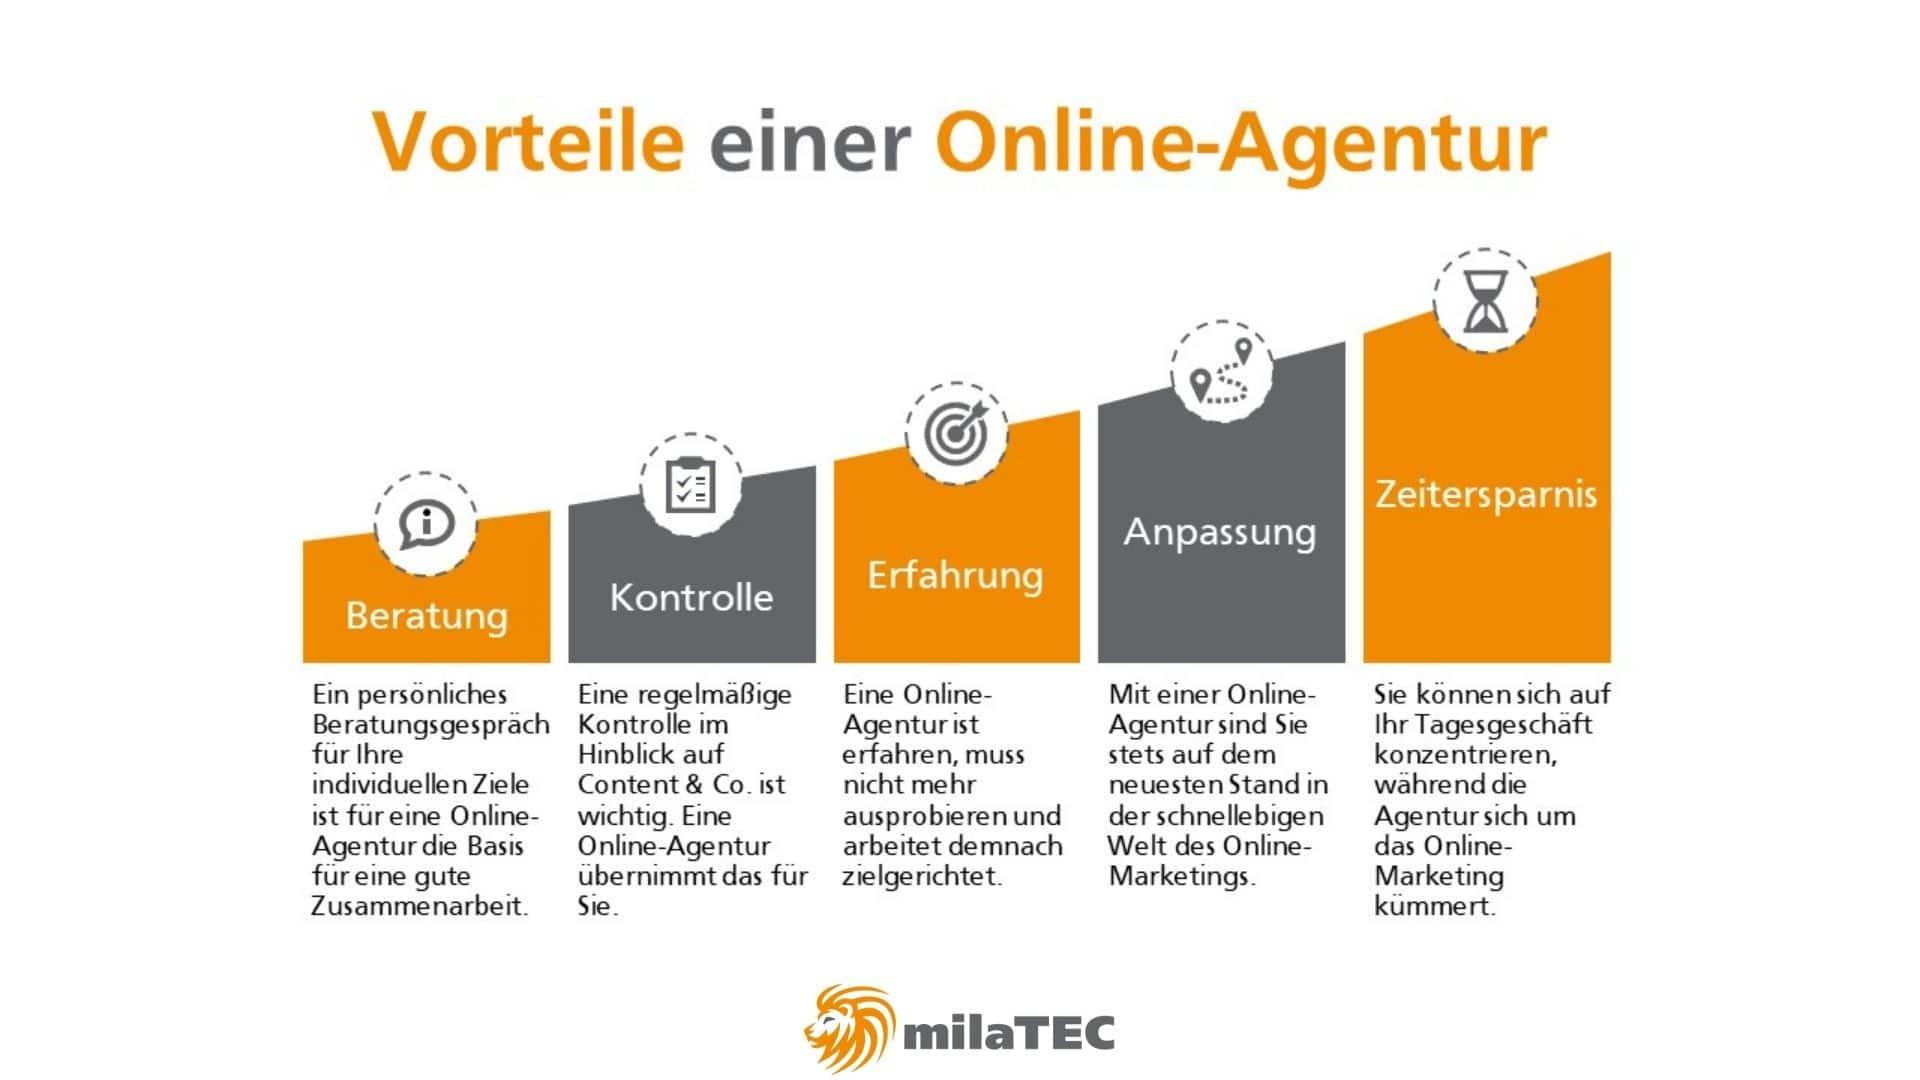 Online-Agentur